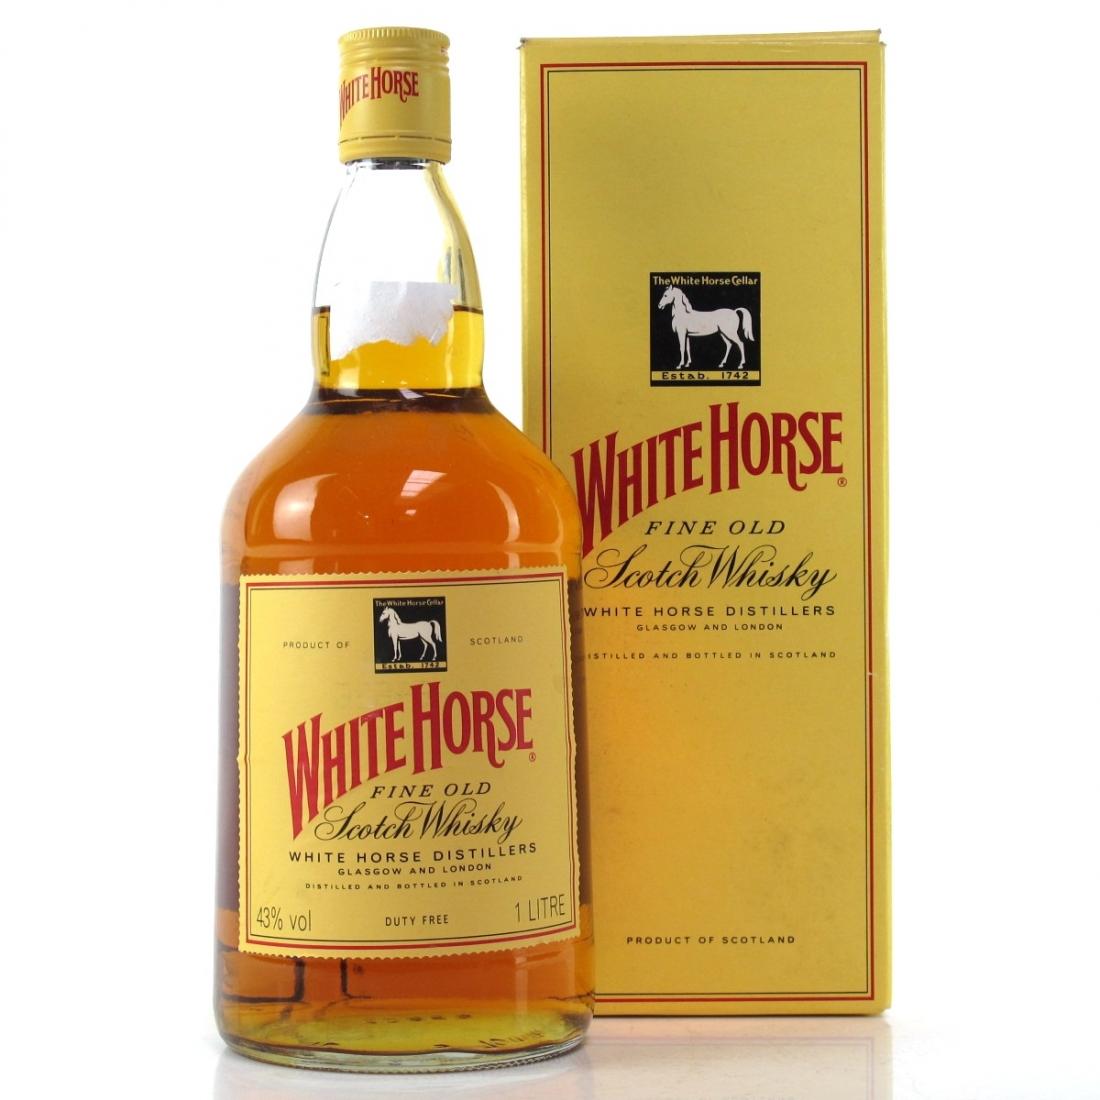 White Horse 1 Litre